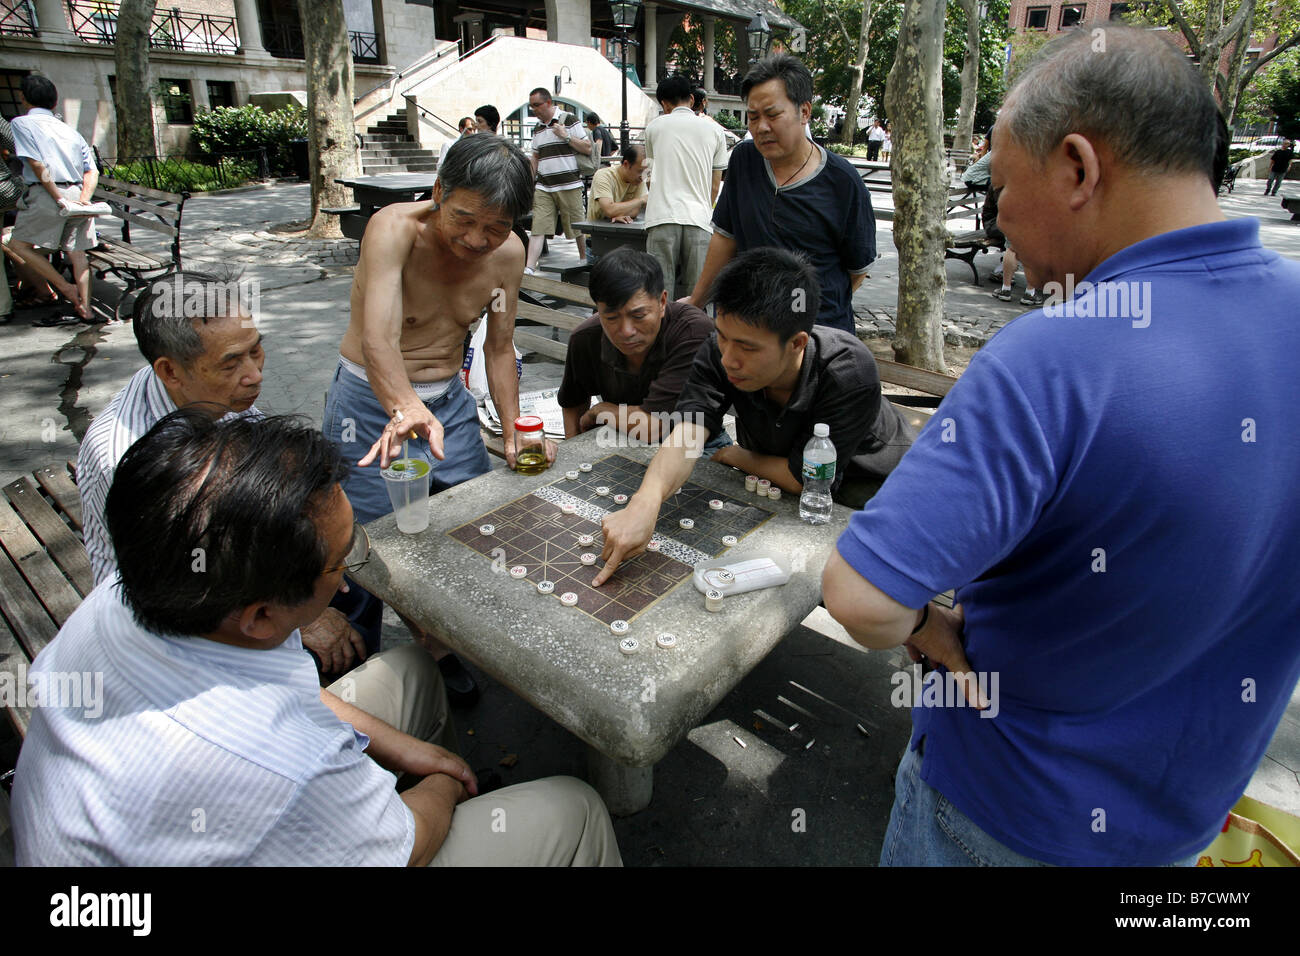 Xiangqi Game, Columbus Park, Chinatown, New York City, USA - Stock Image